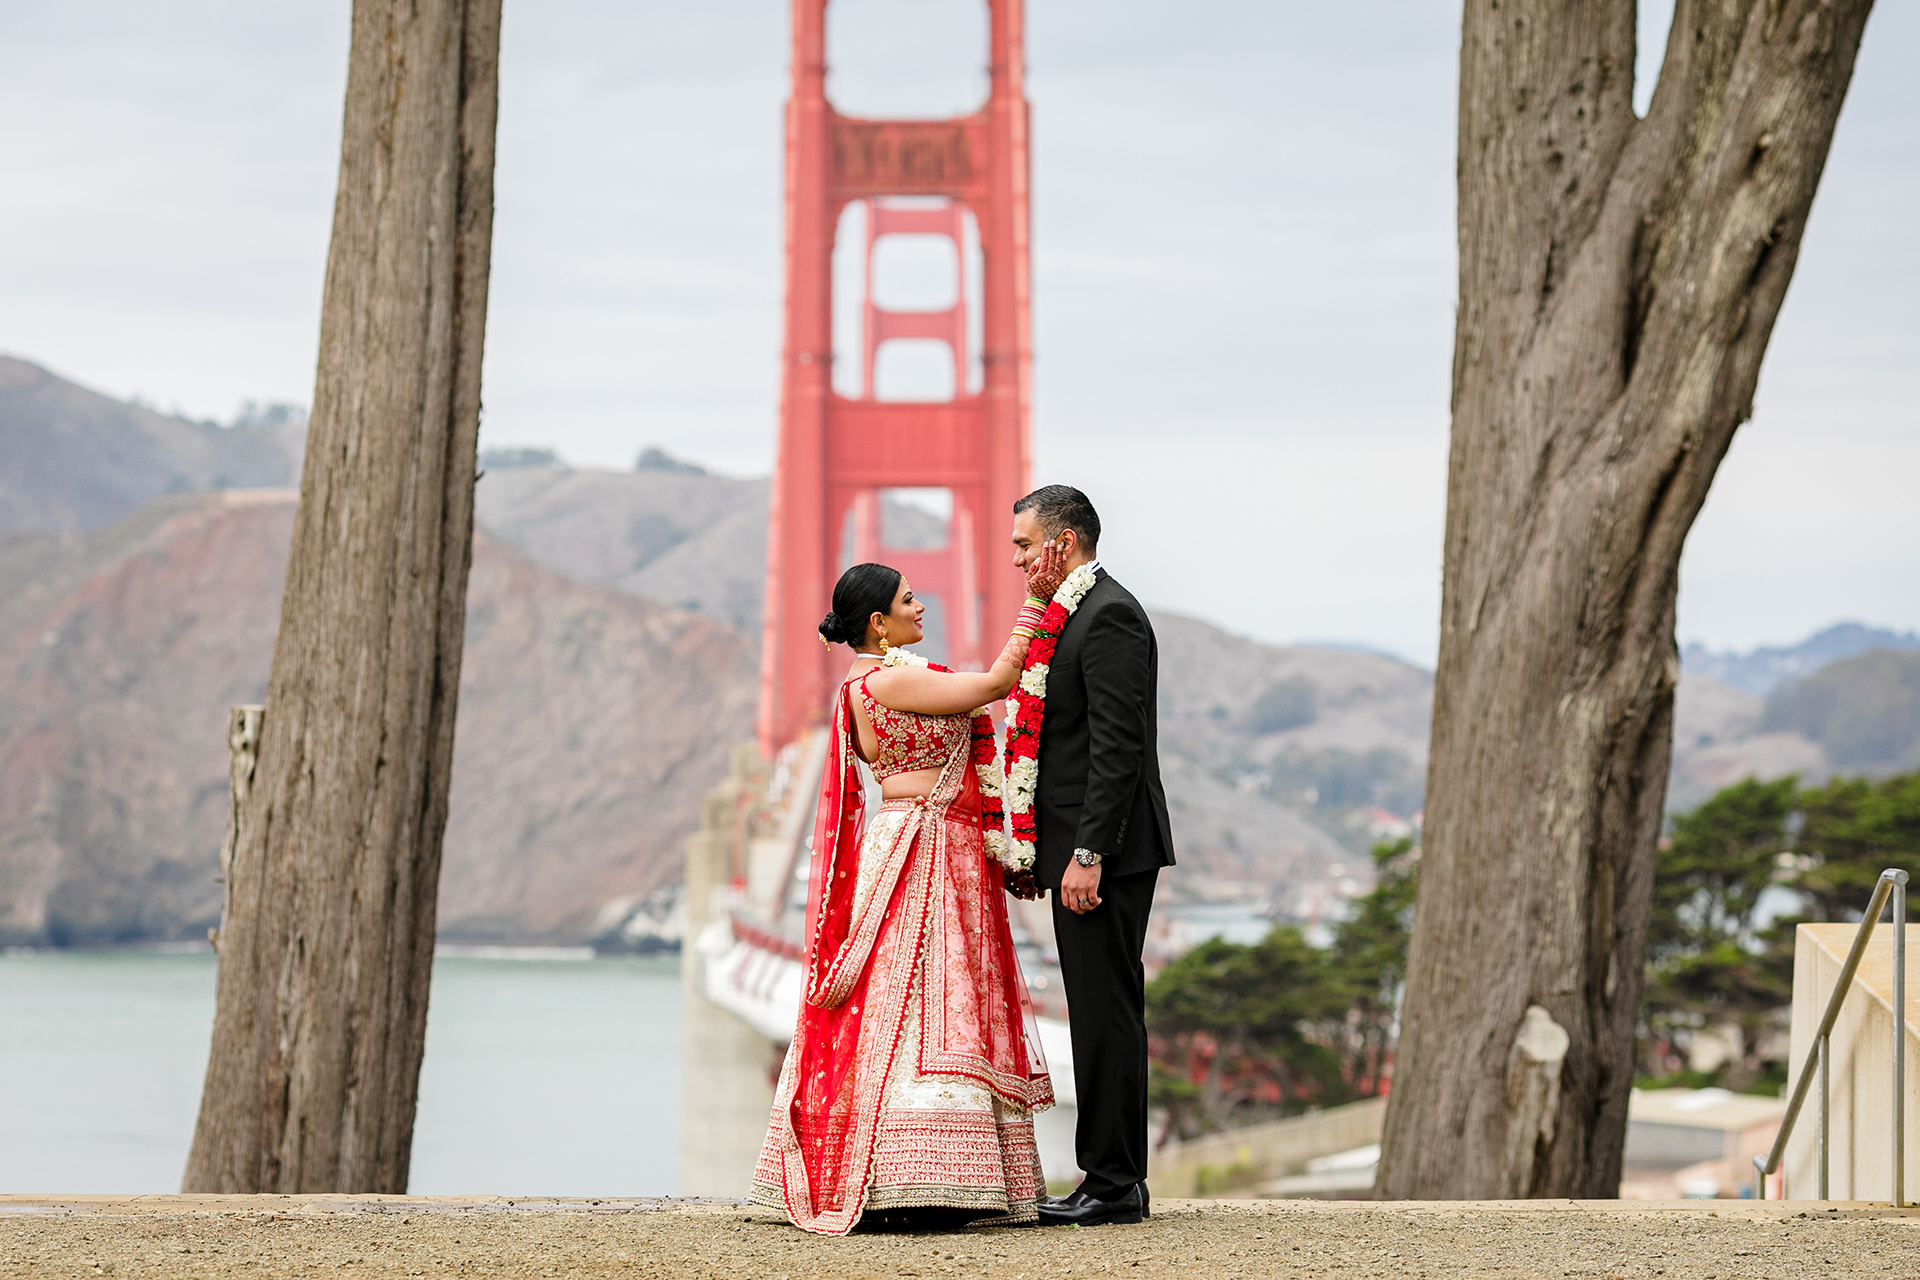 Golden Gate Overlook Wedding Images | Couple Standing in front of the Golden Gate Bridge